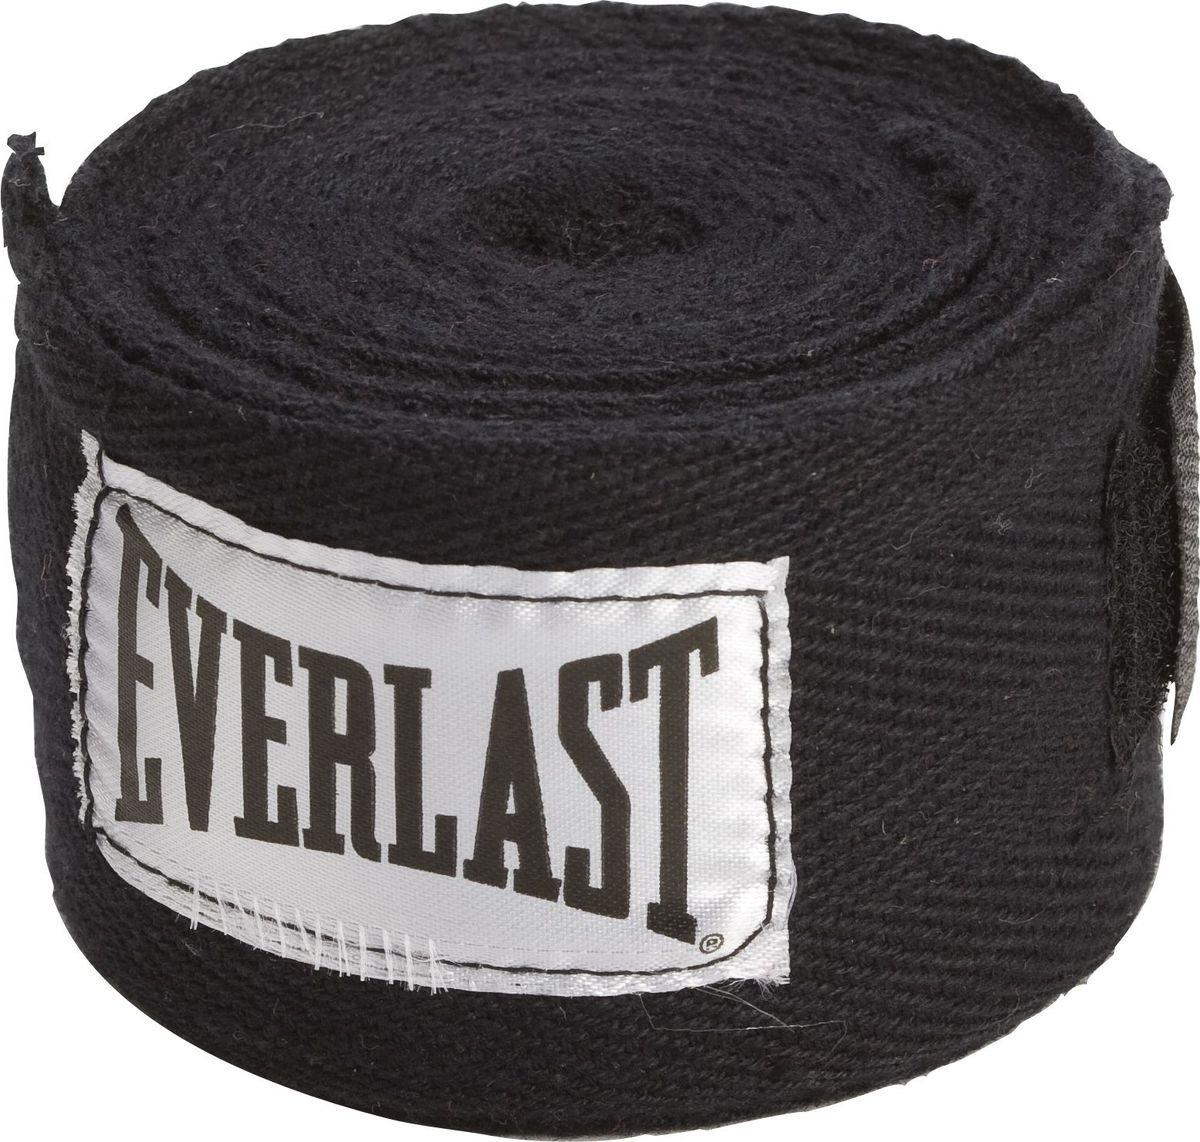 Боксерский бинт Everlast Elastic, 4464CAMO, зеленый, 3,5 м